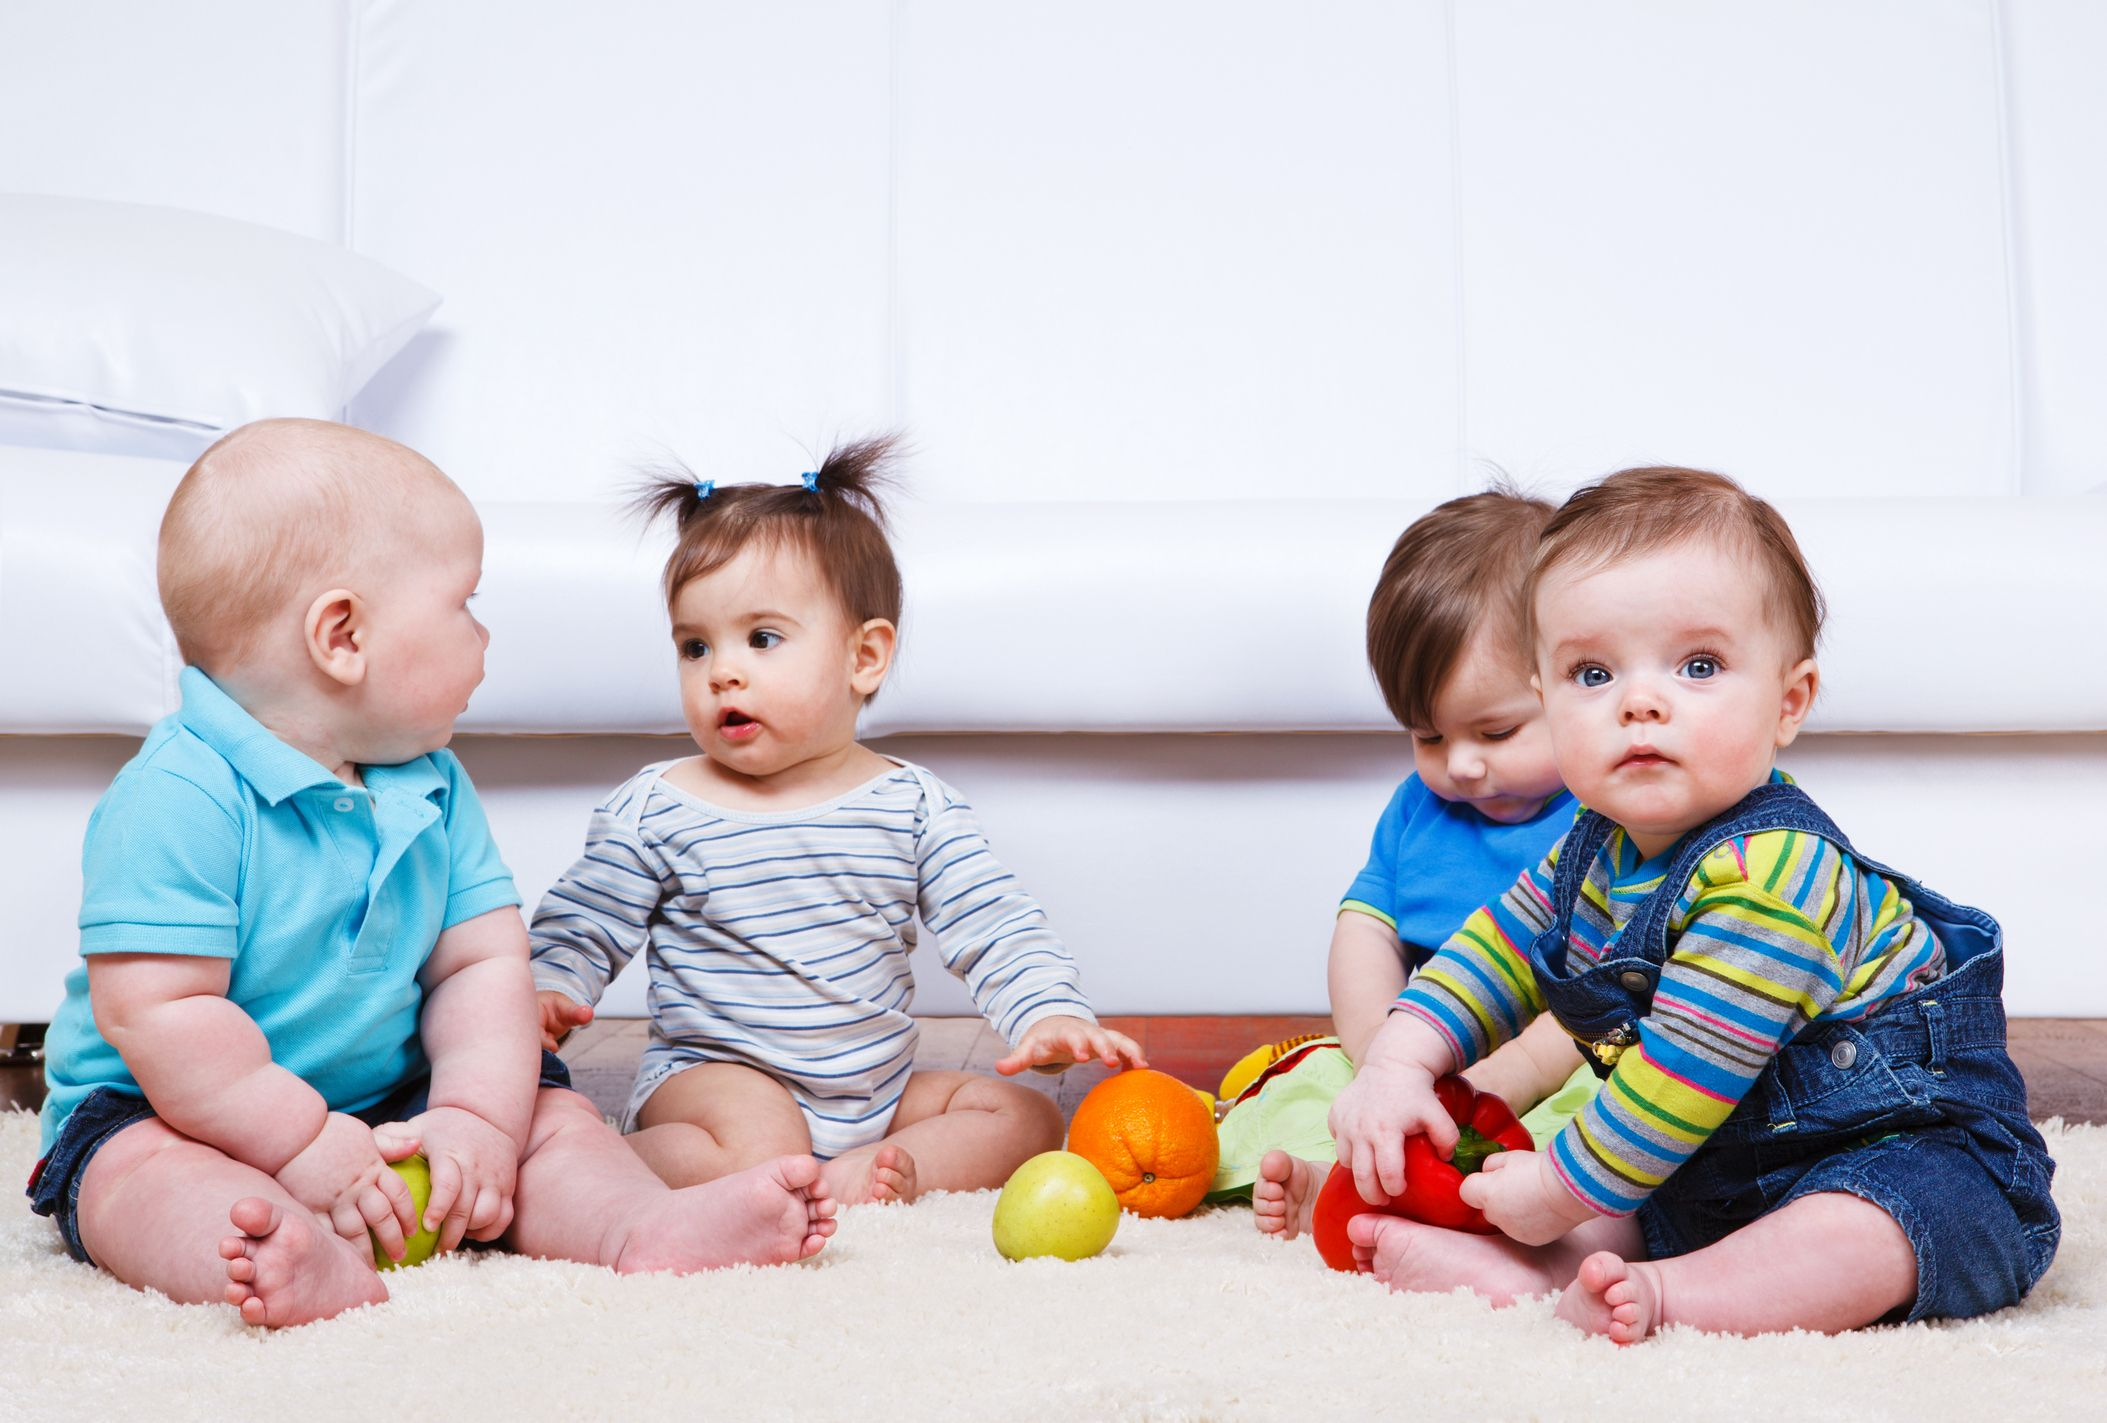 babies-baby-istock